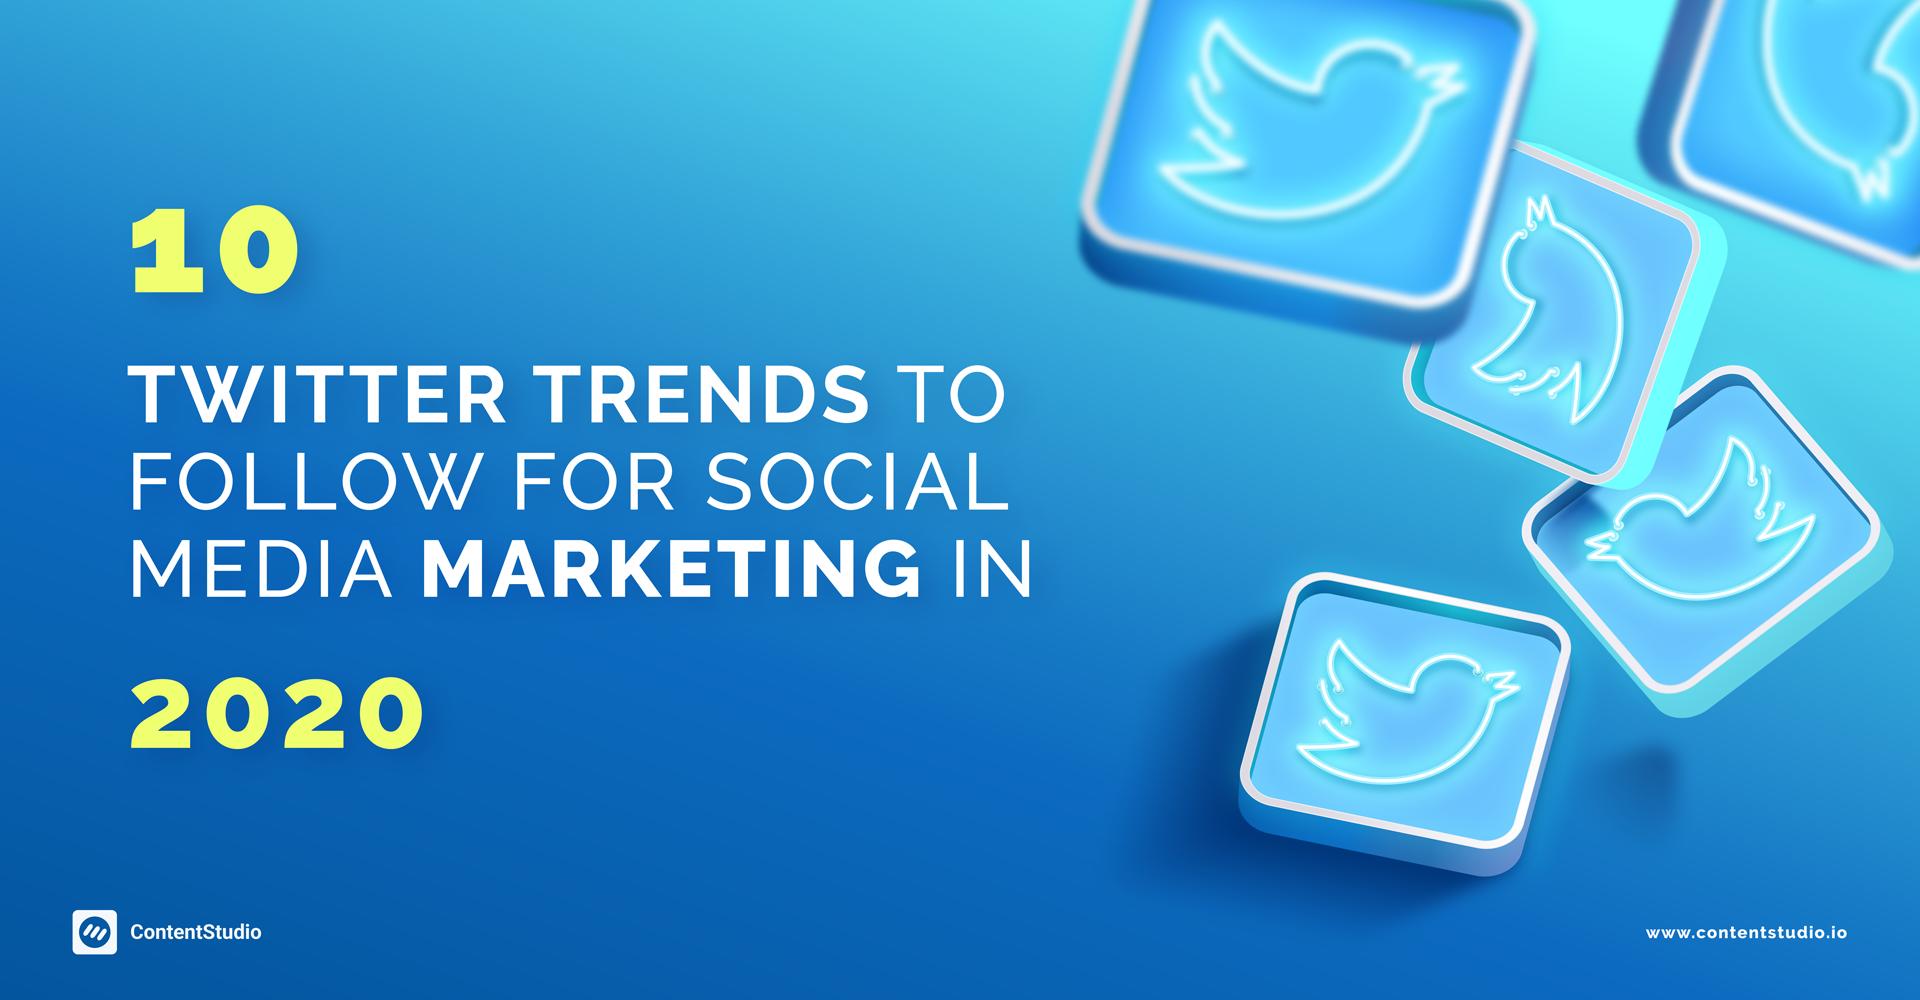 Twitter marketing trends 2020